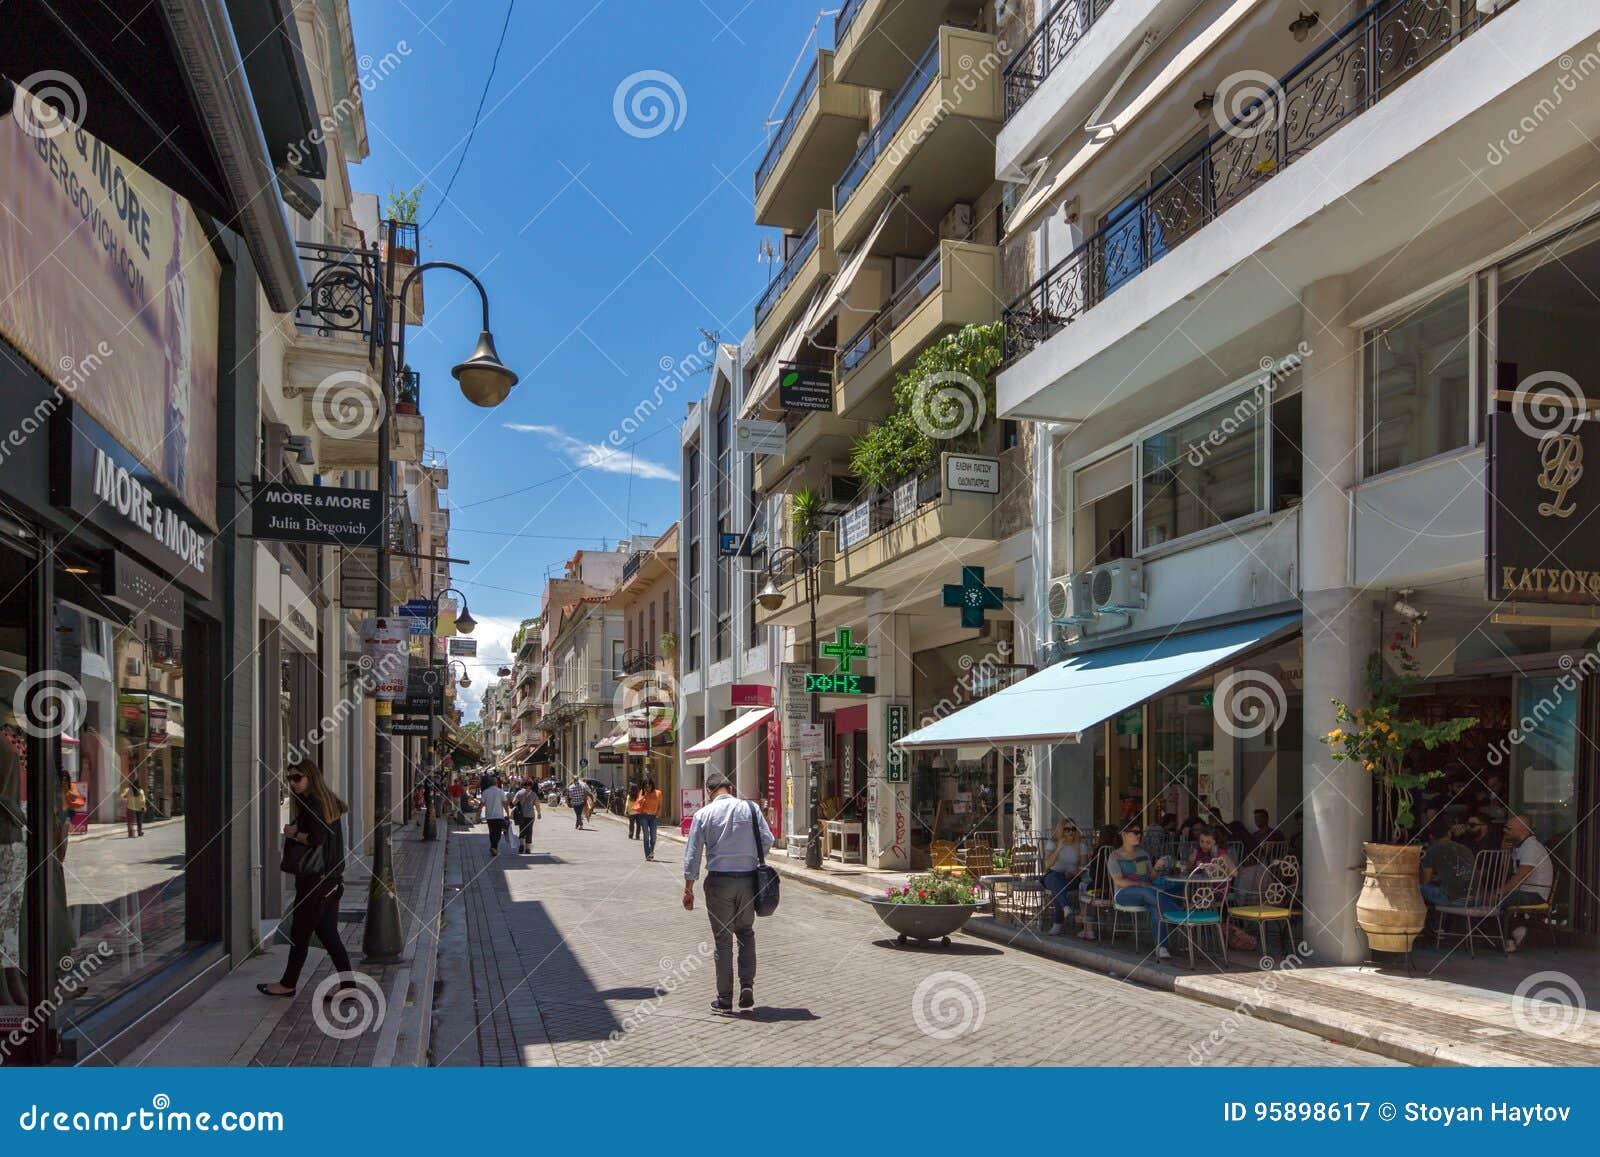 Typical street in Patras, Peloponnese, Western Greece